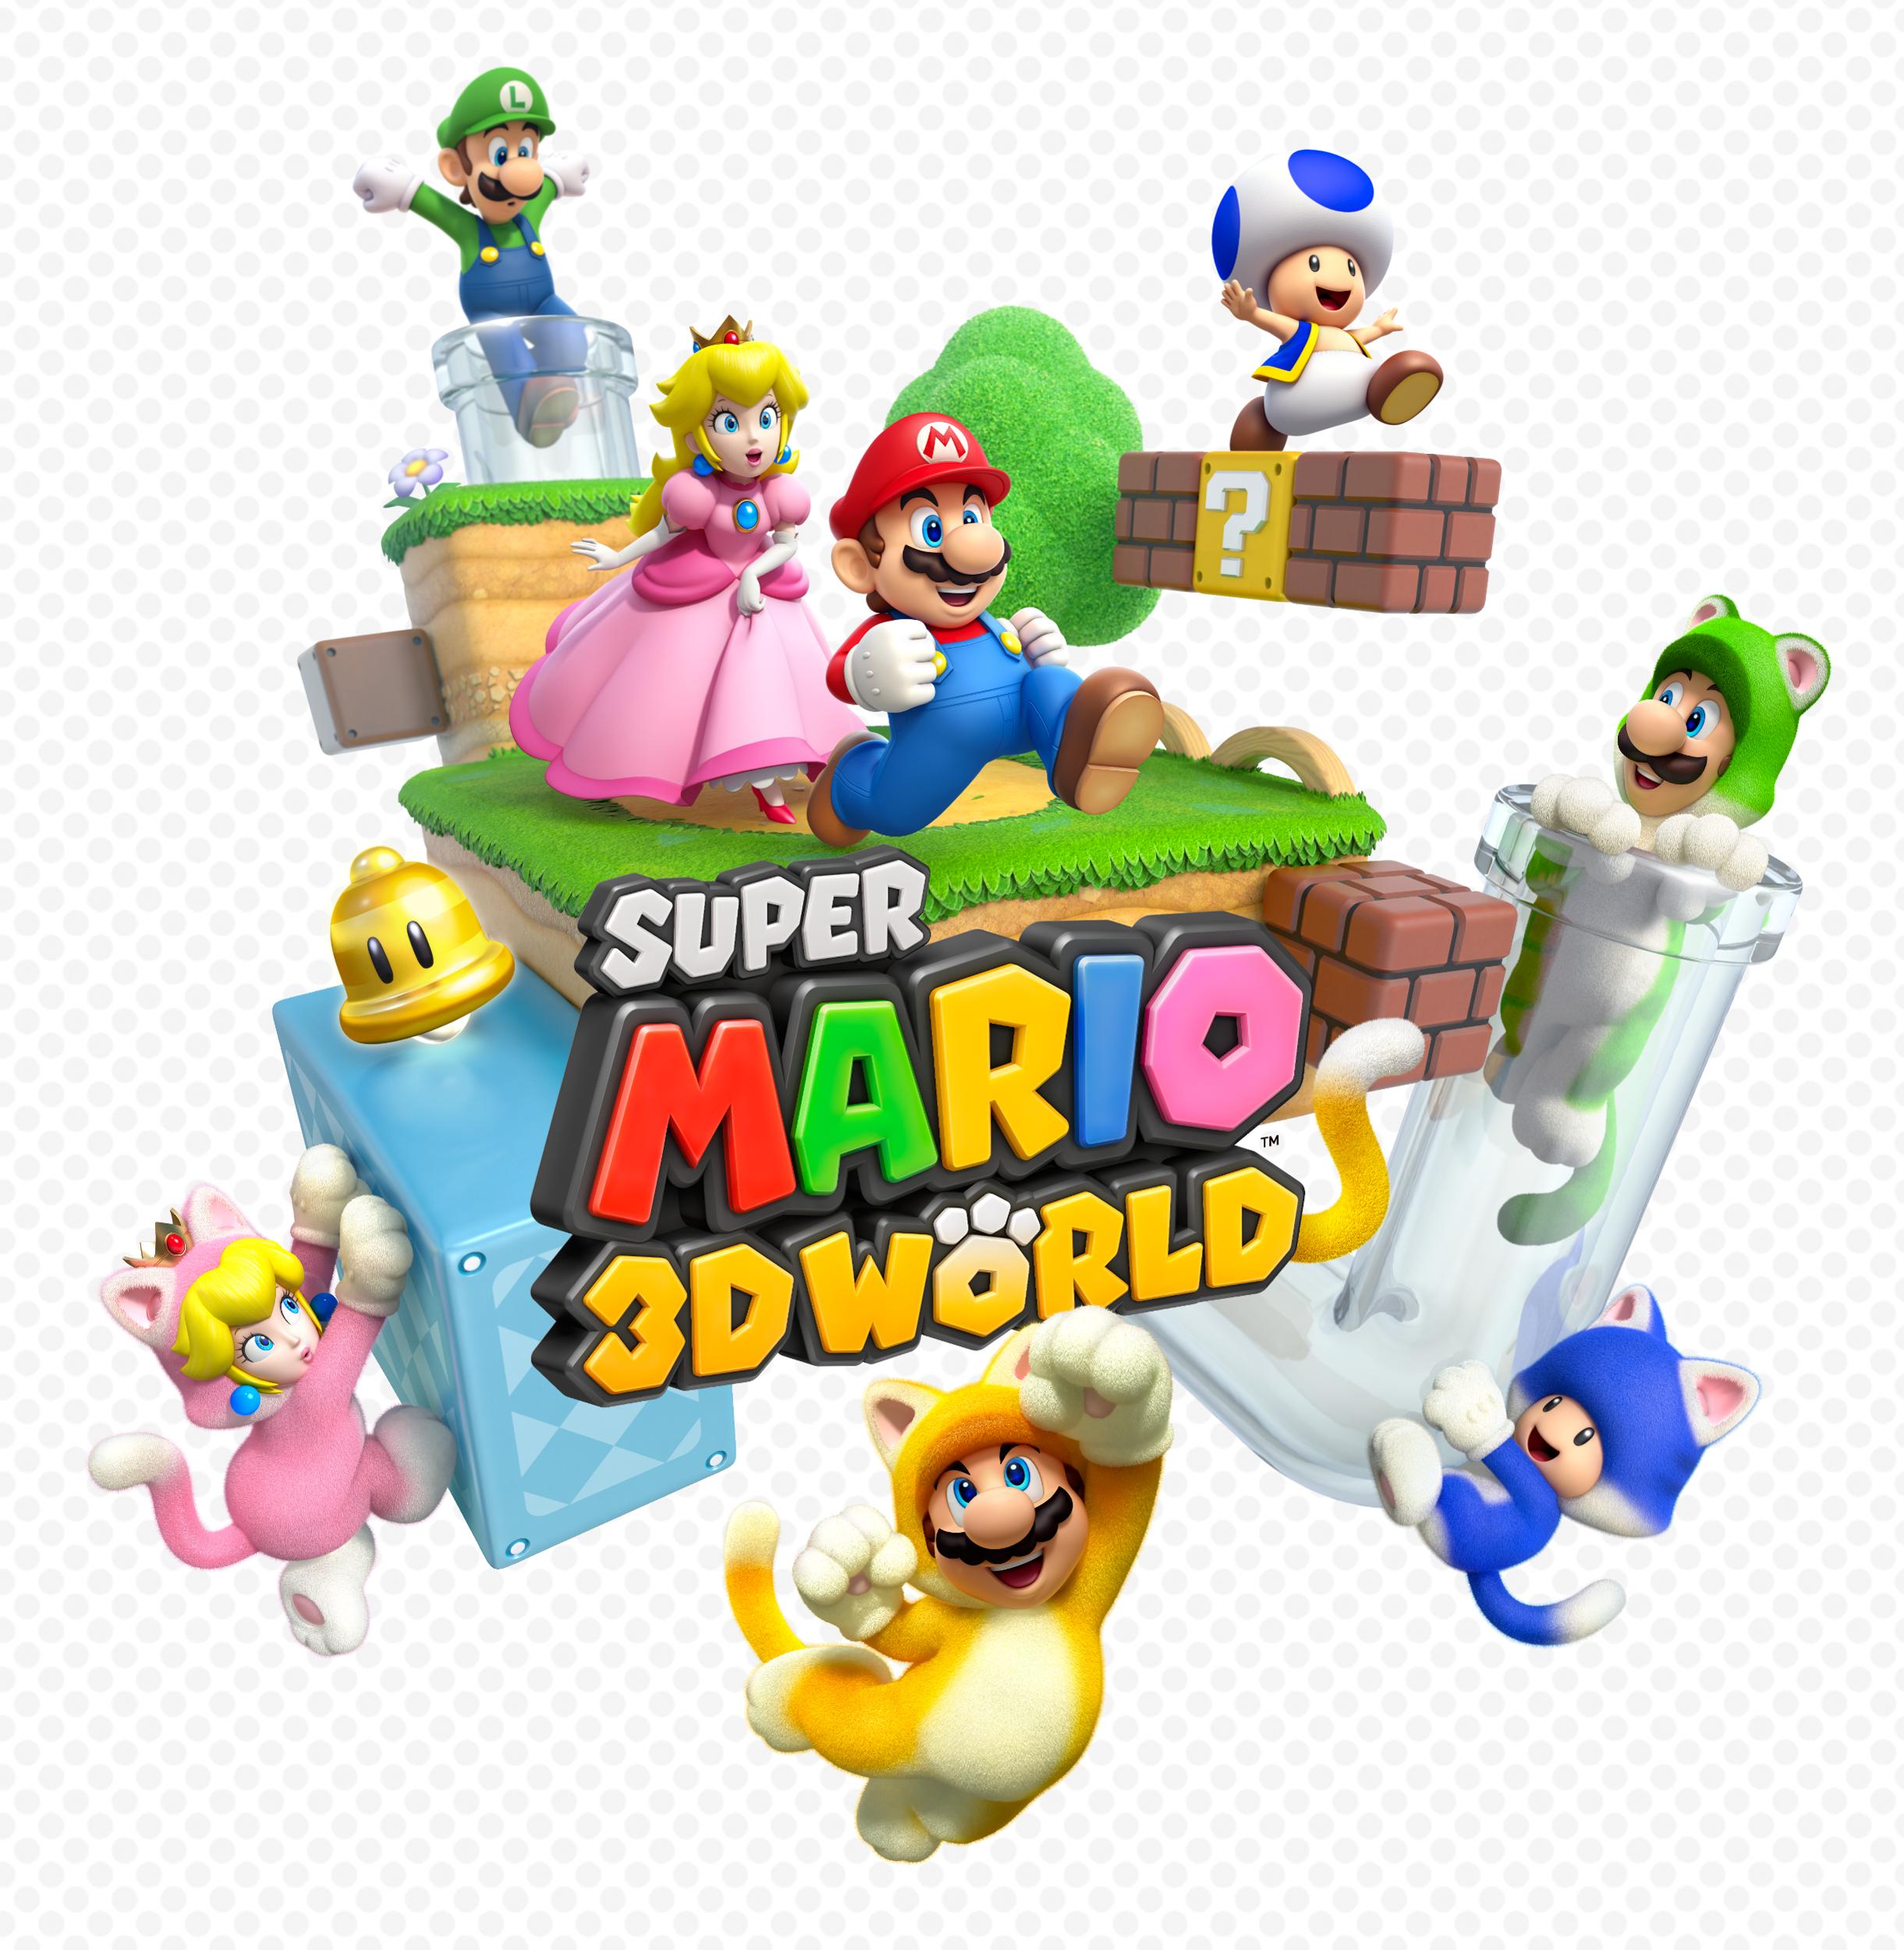 Super Mario 3d World Artwork